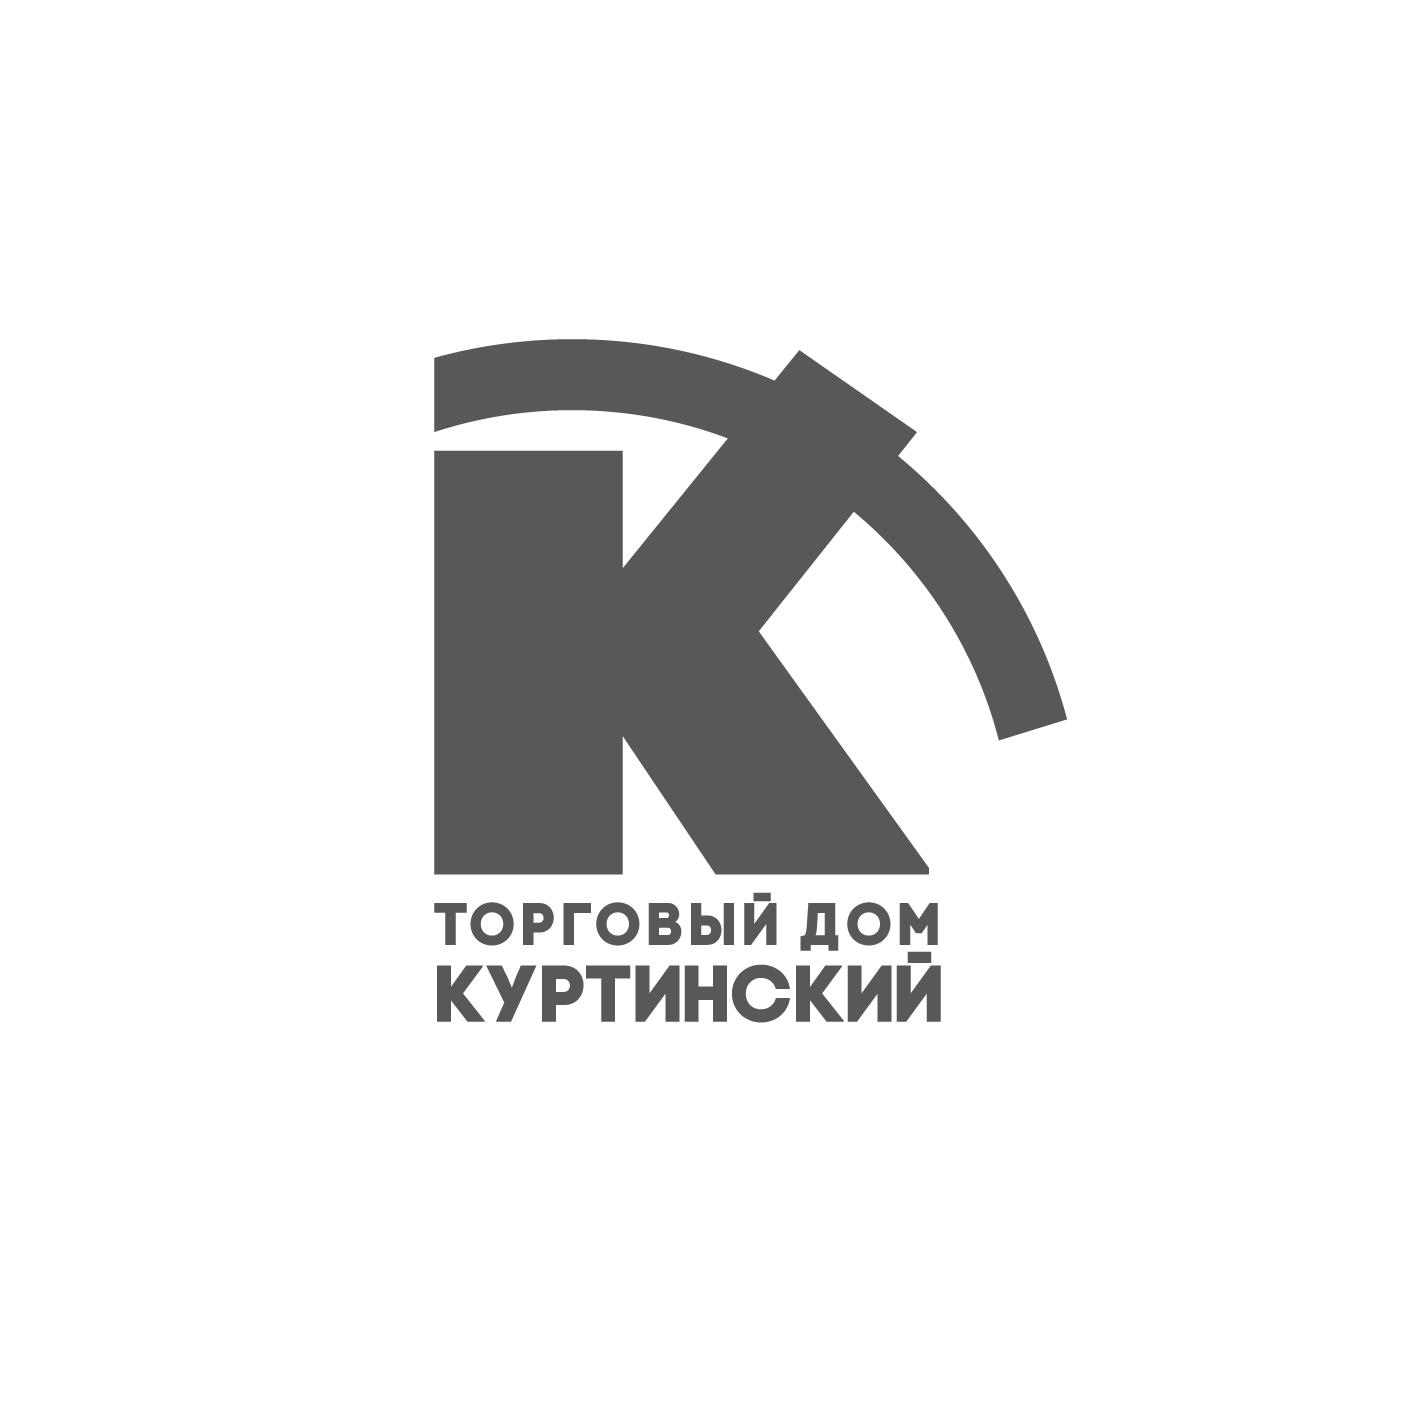 Логотип для камнедобывающей компании фото f_7035b995b7b011d2.png